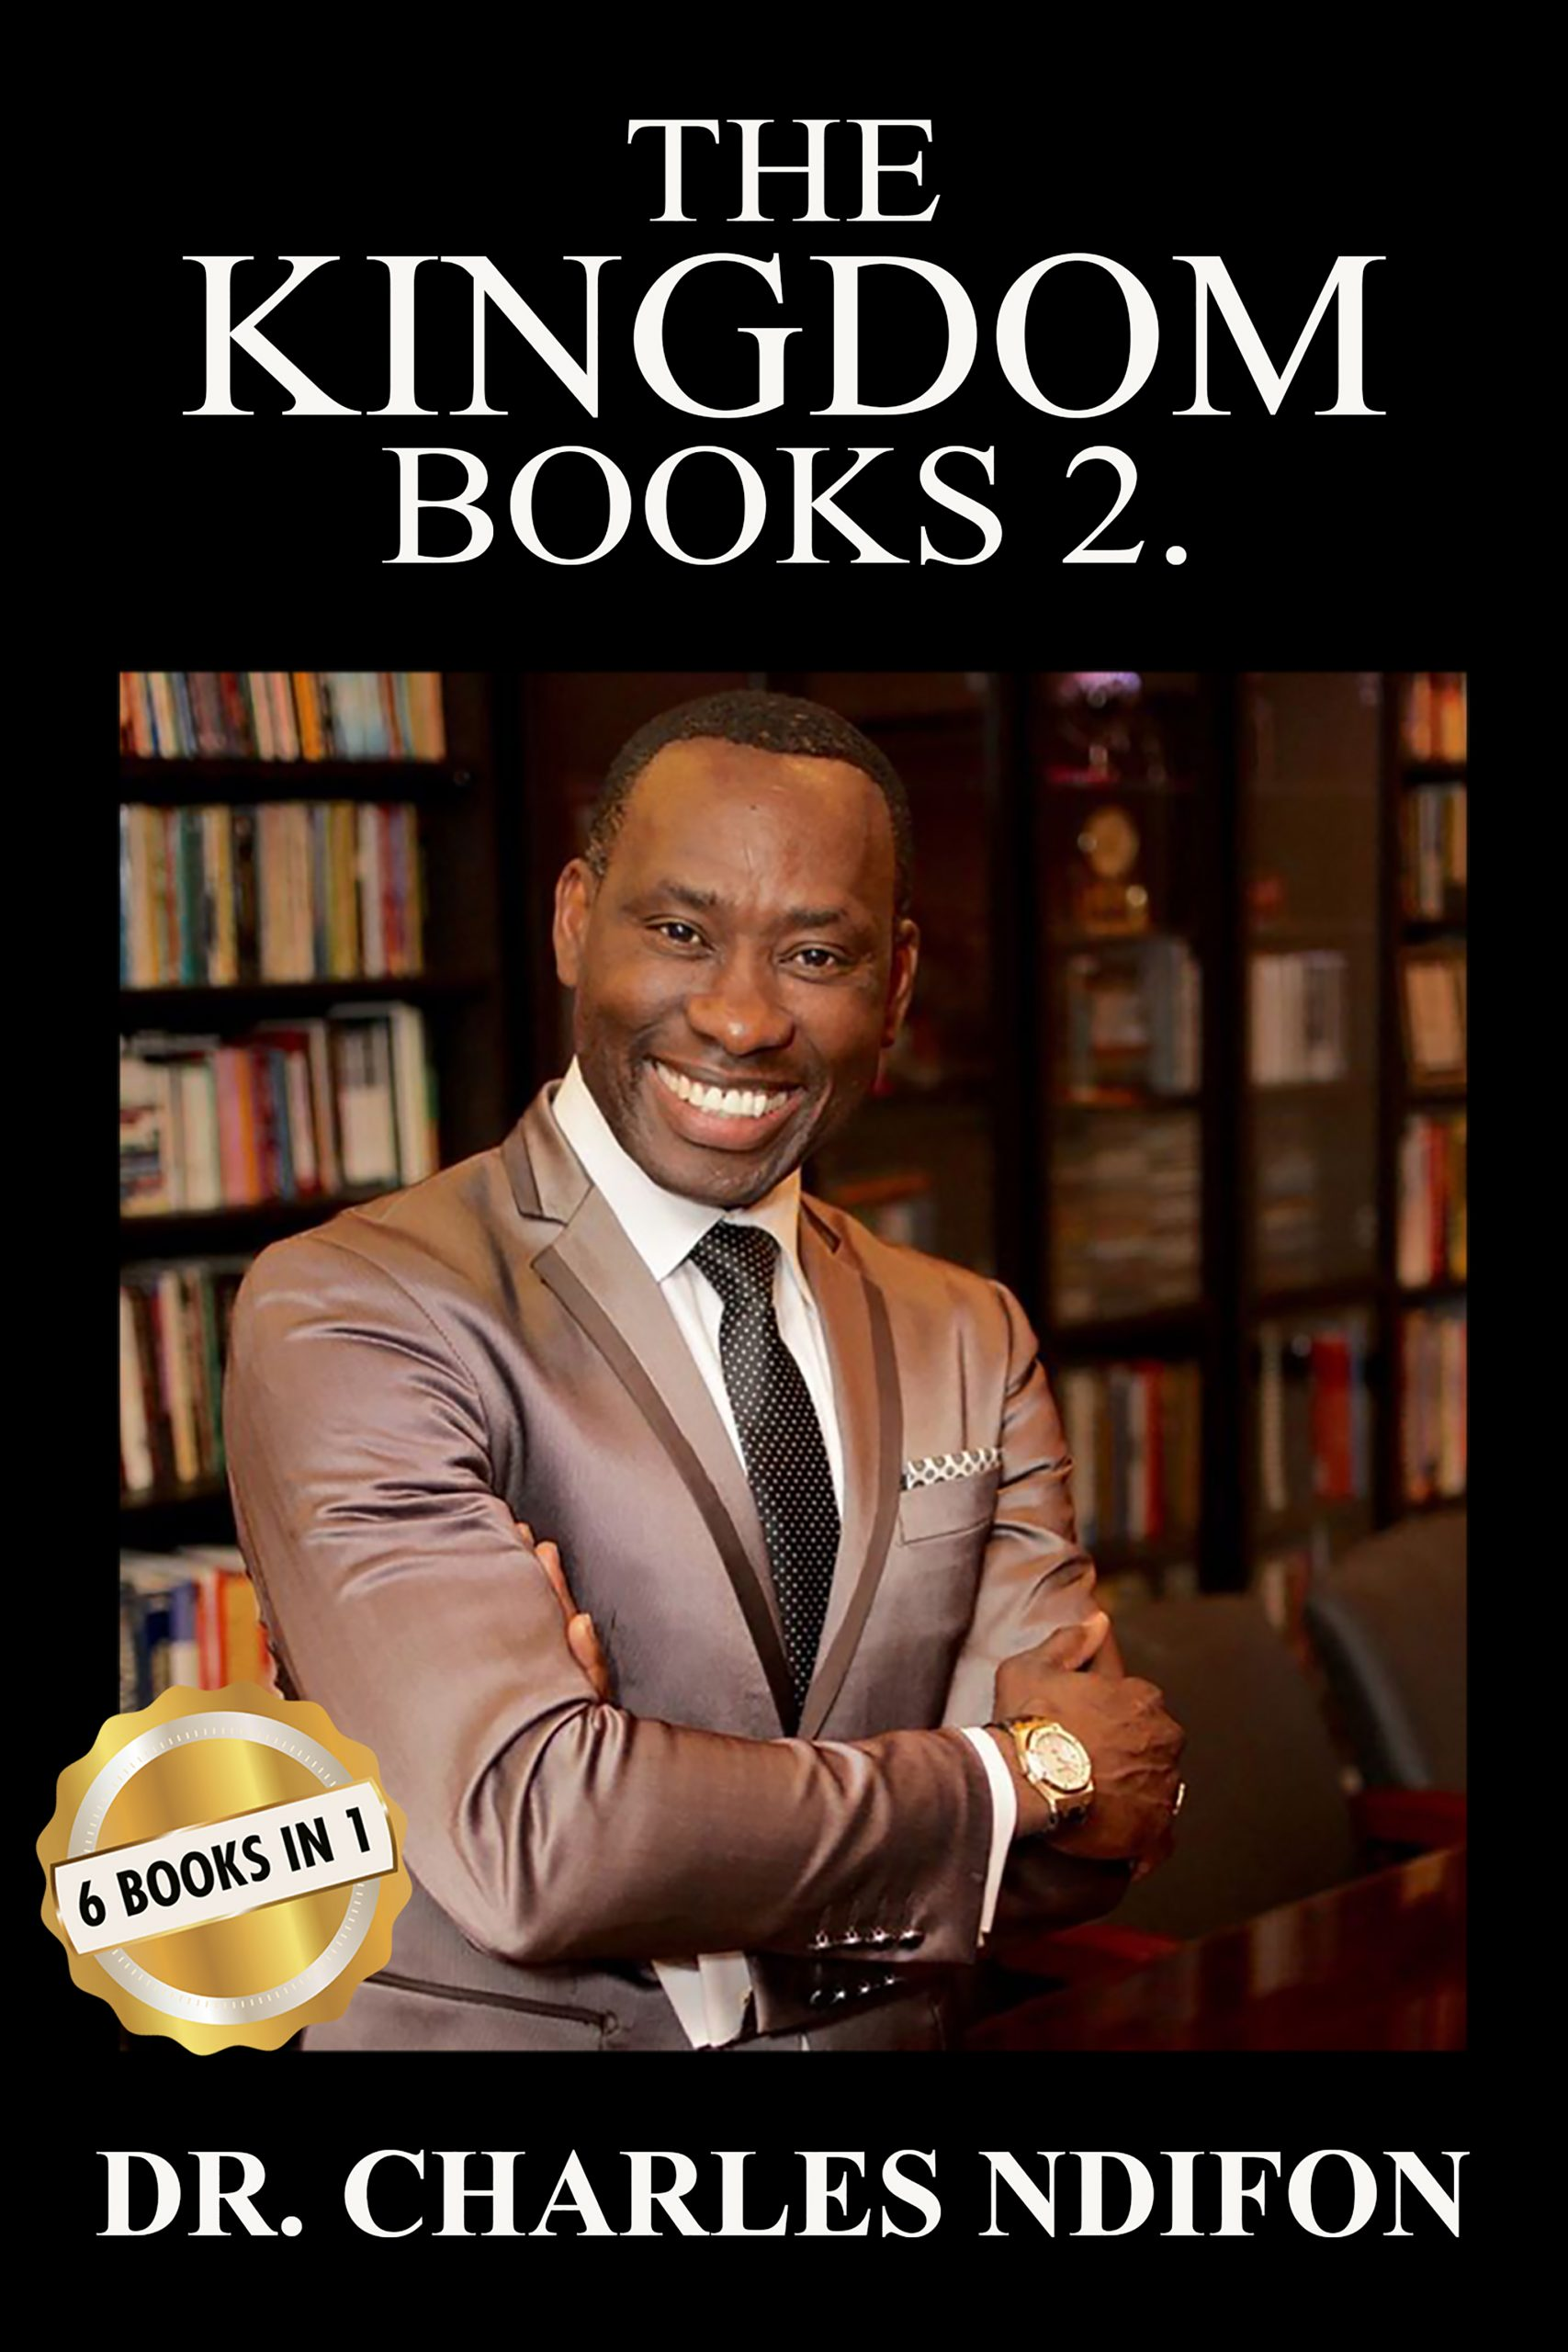 The Kingdom Books 2